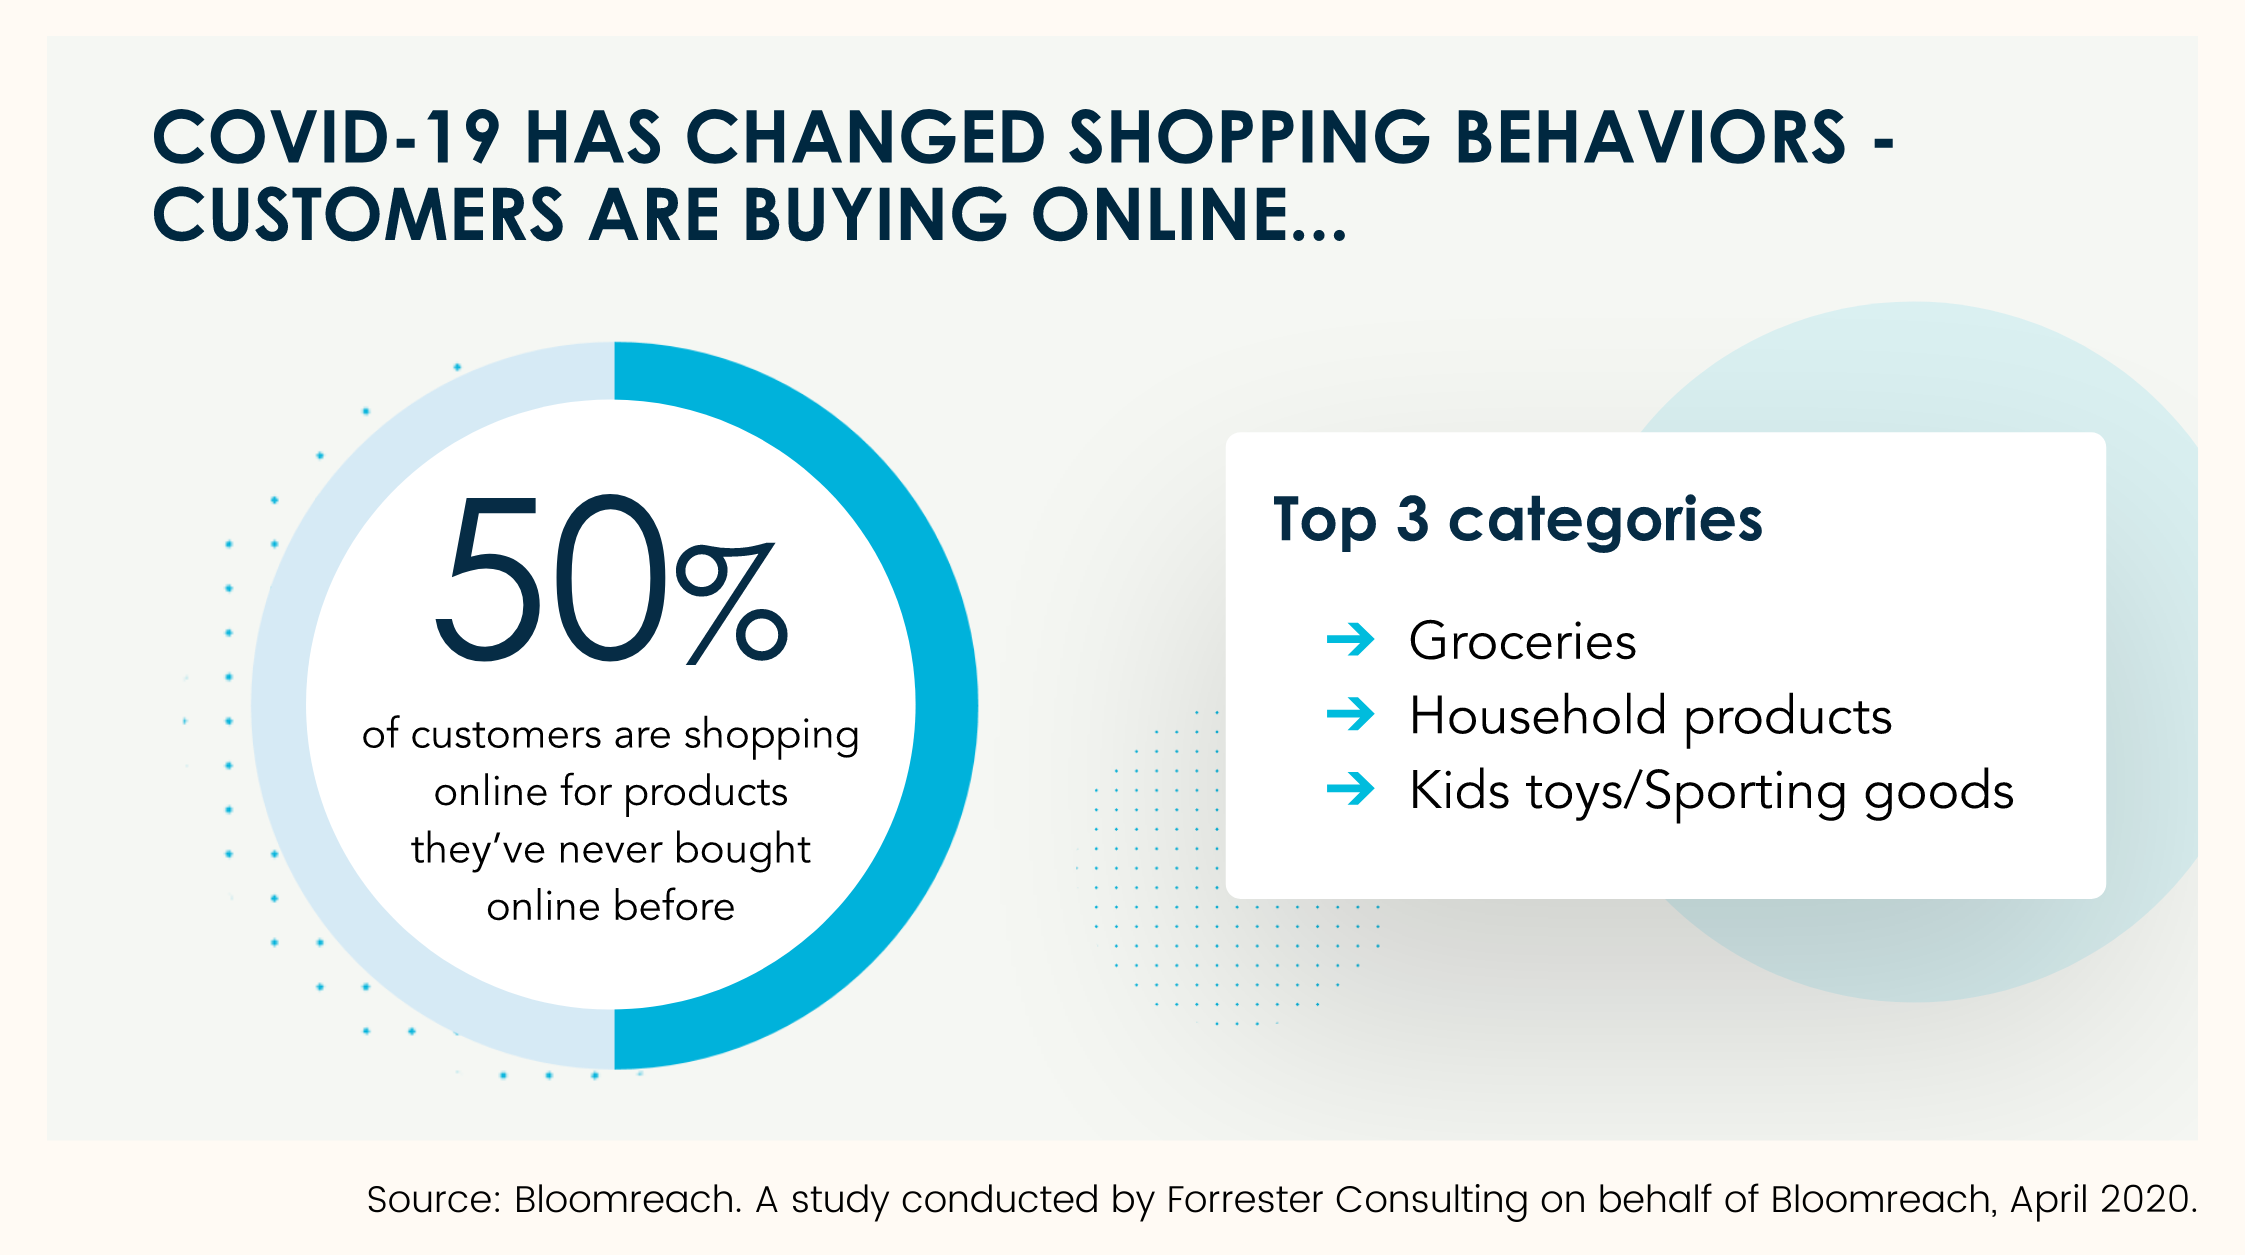 covid-19 changed shopping behaviors